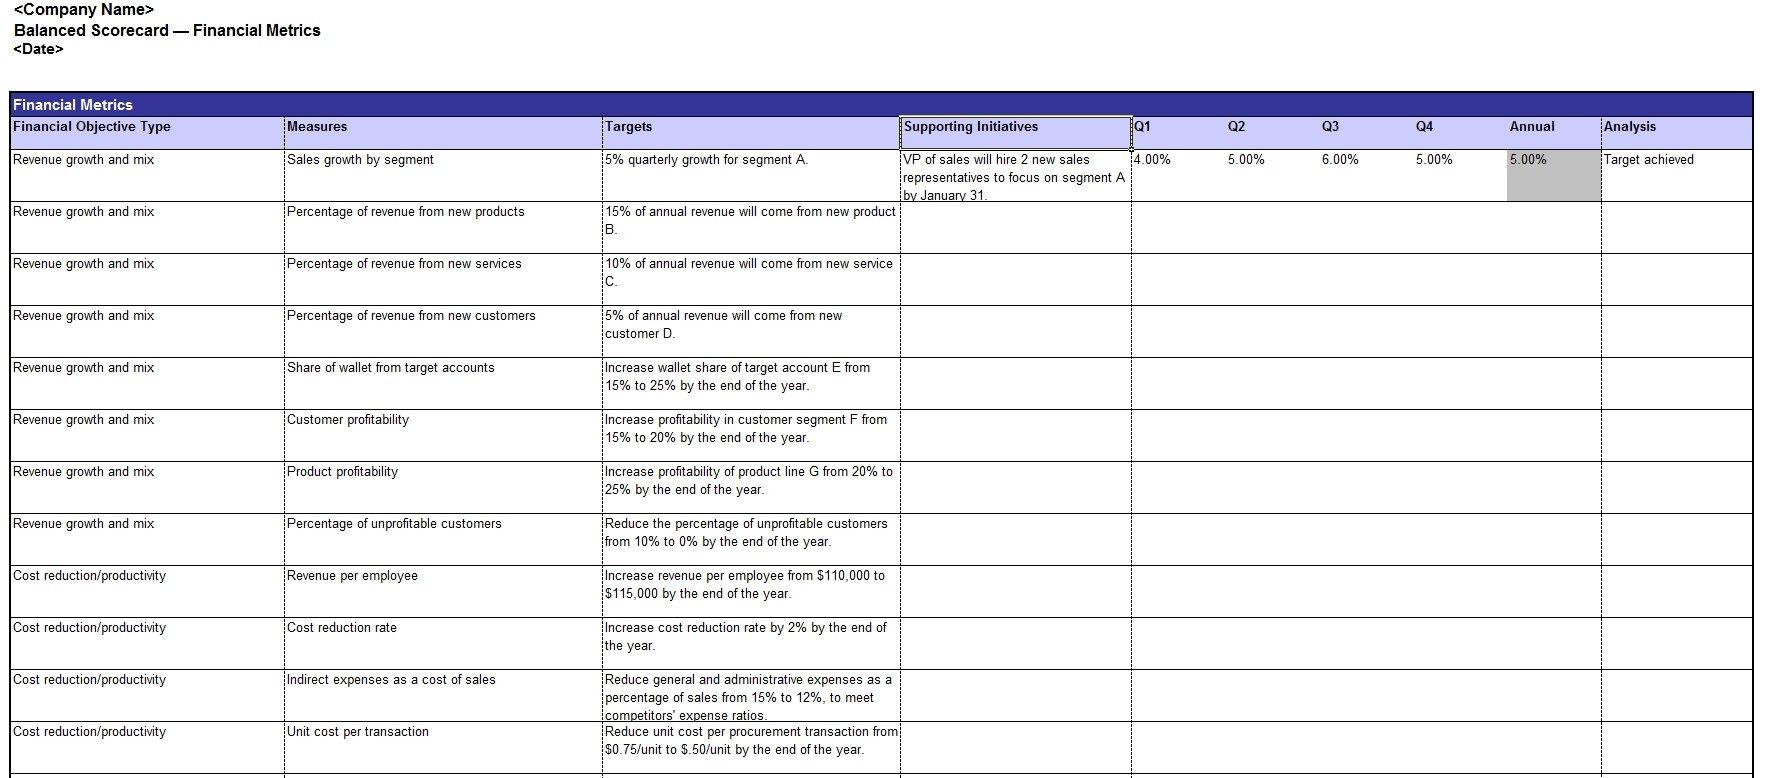 Balanced Scorecard Template Excel Balance Scorecard Template Excel Templates